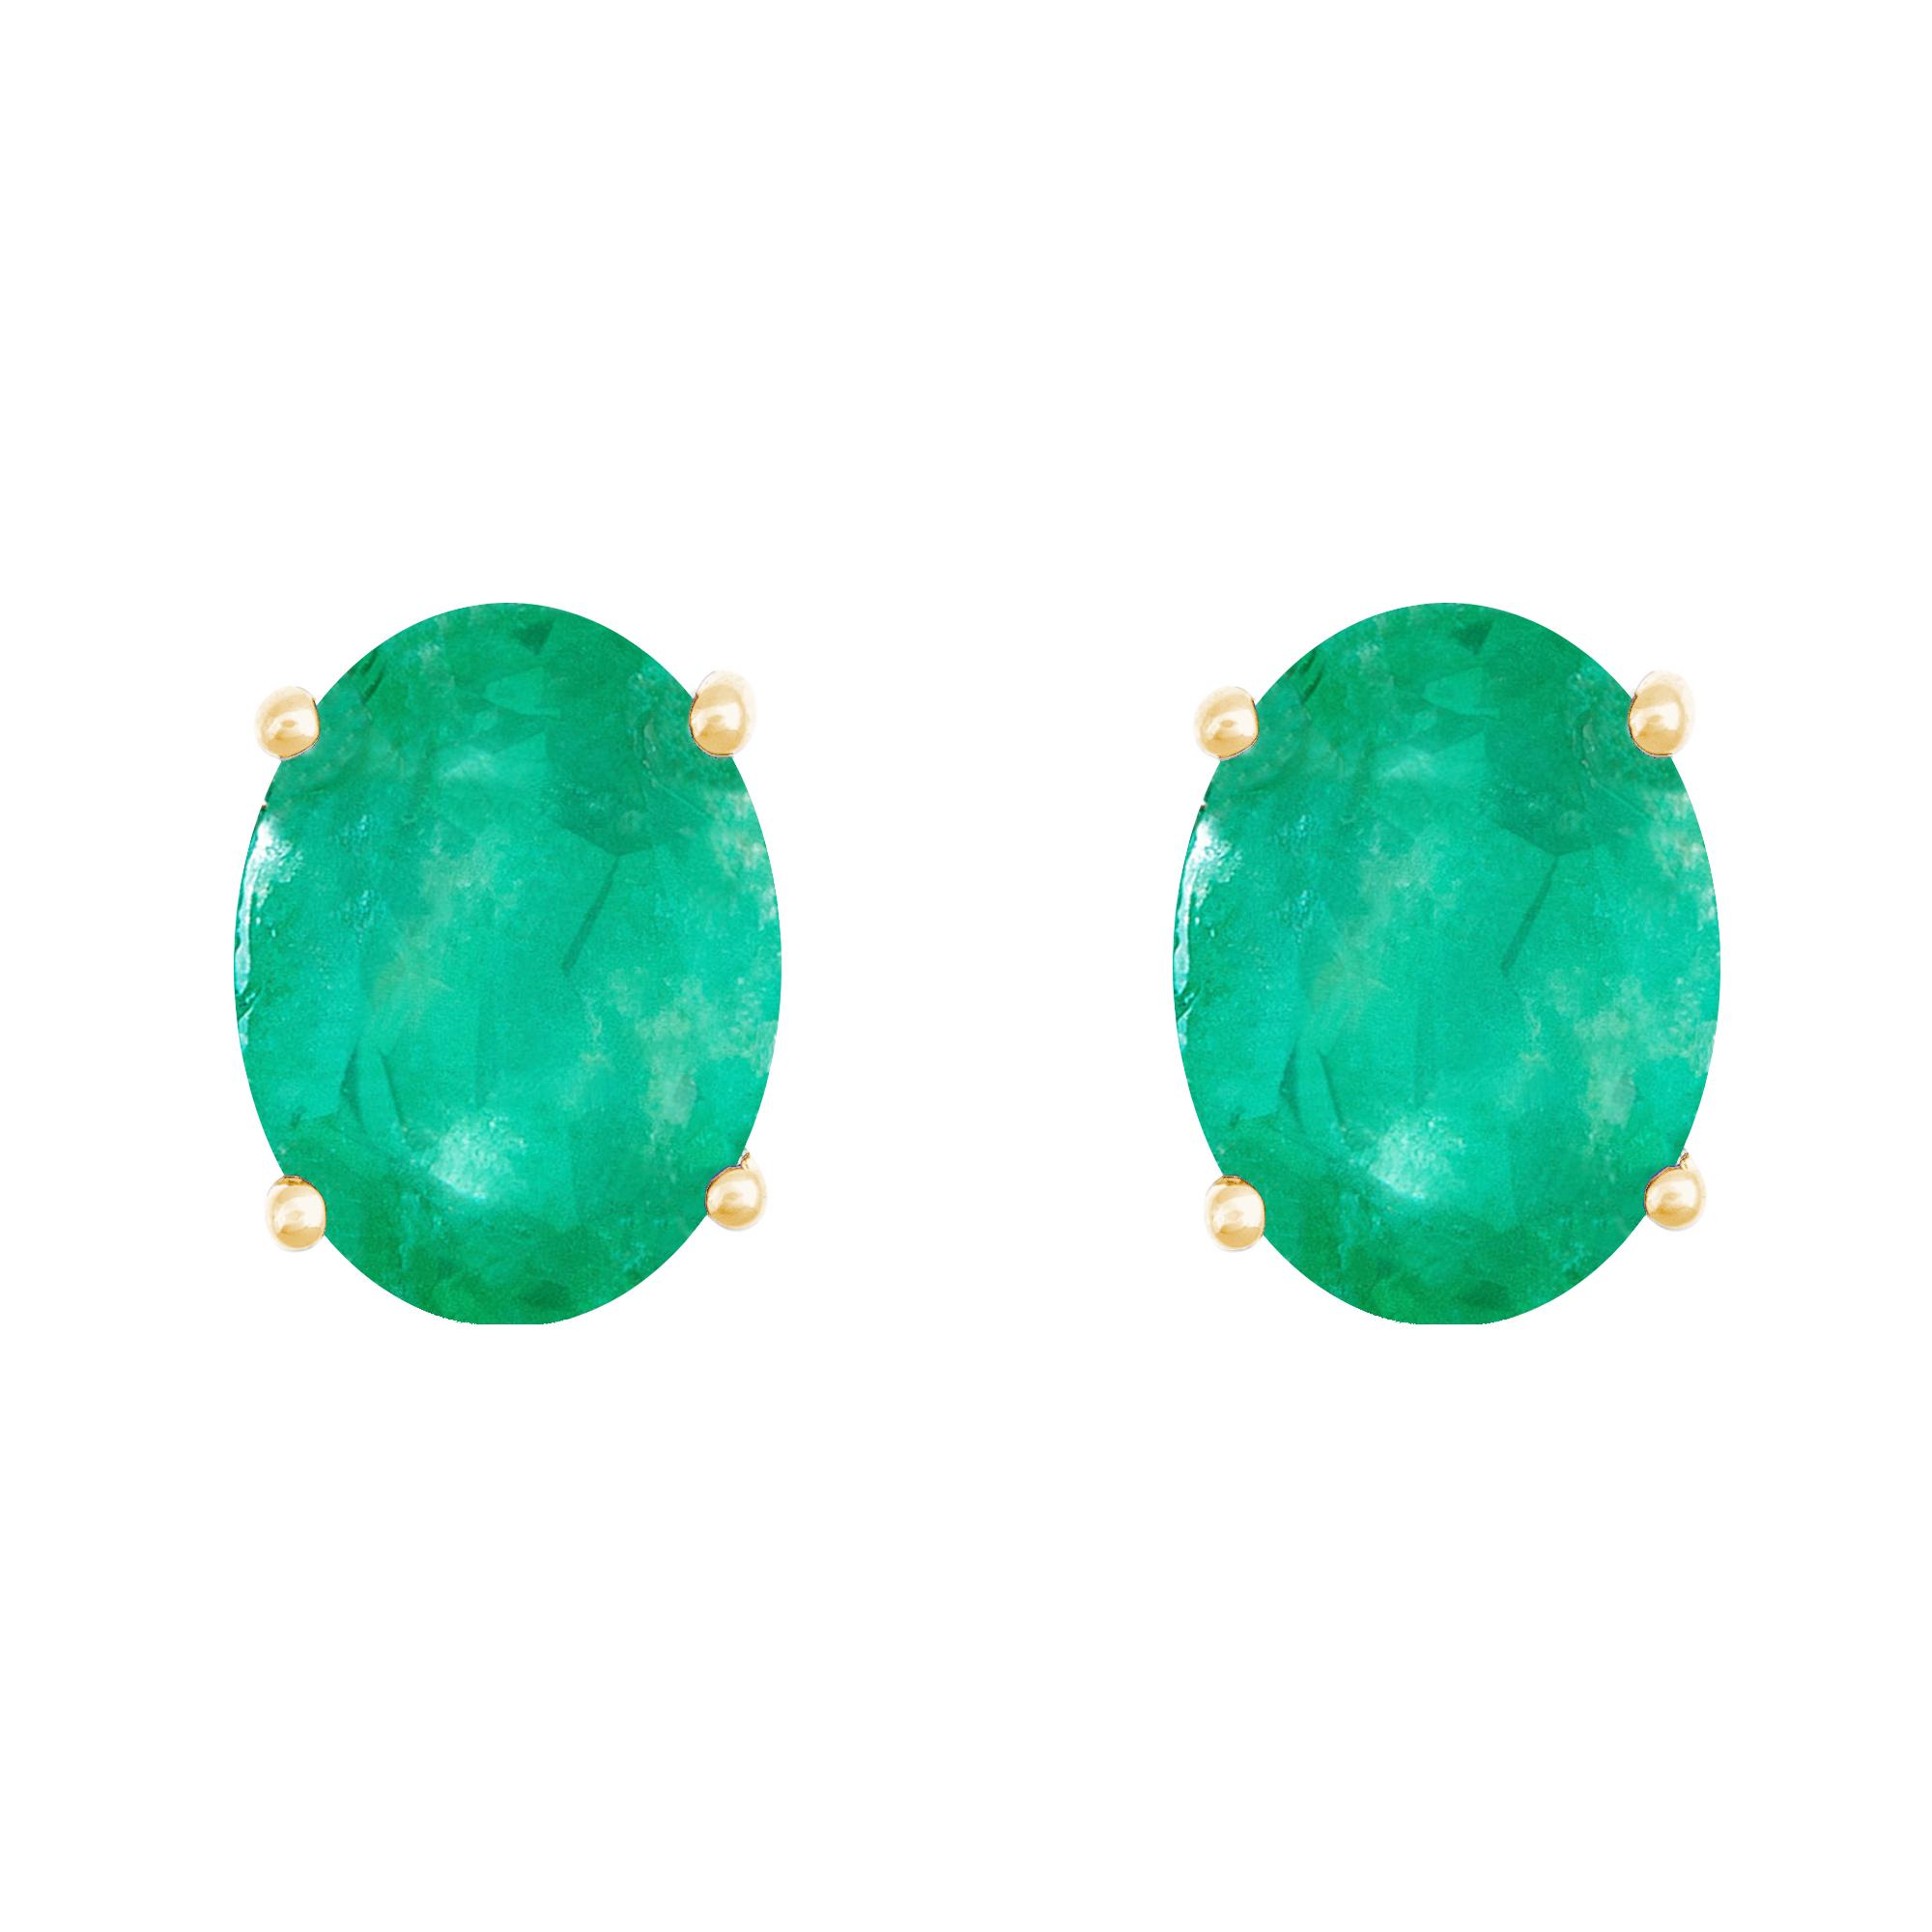 8x6mm oval birthstone stud earrings in 14kt yellow gold